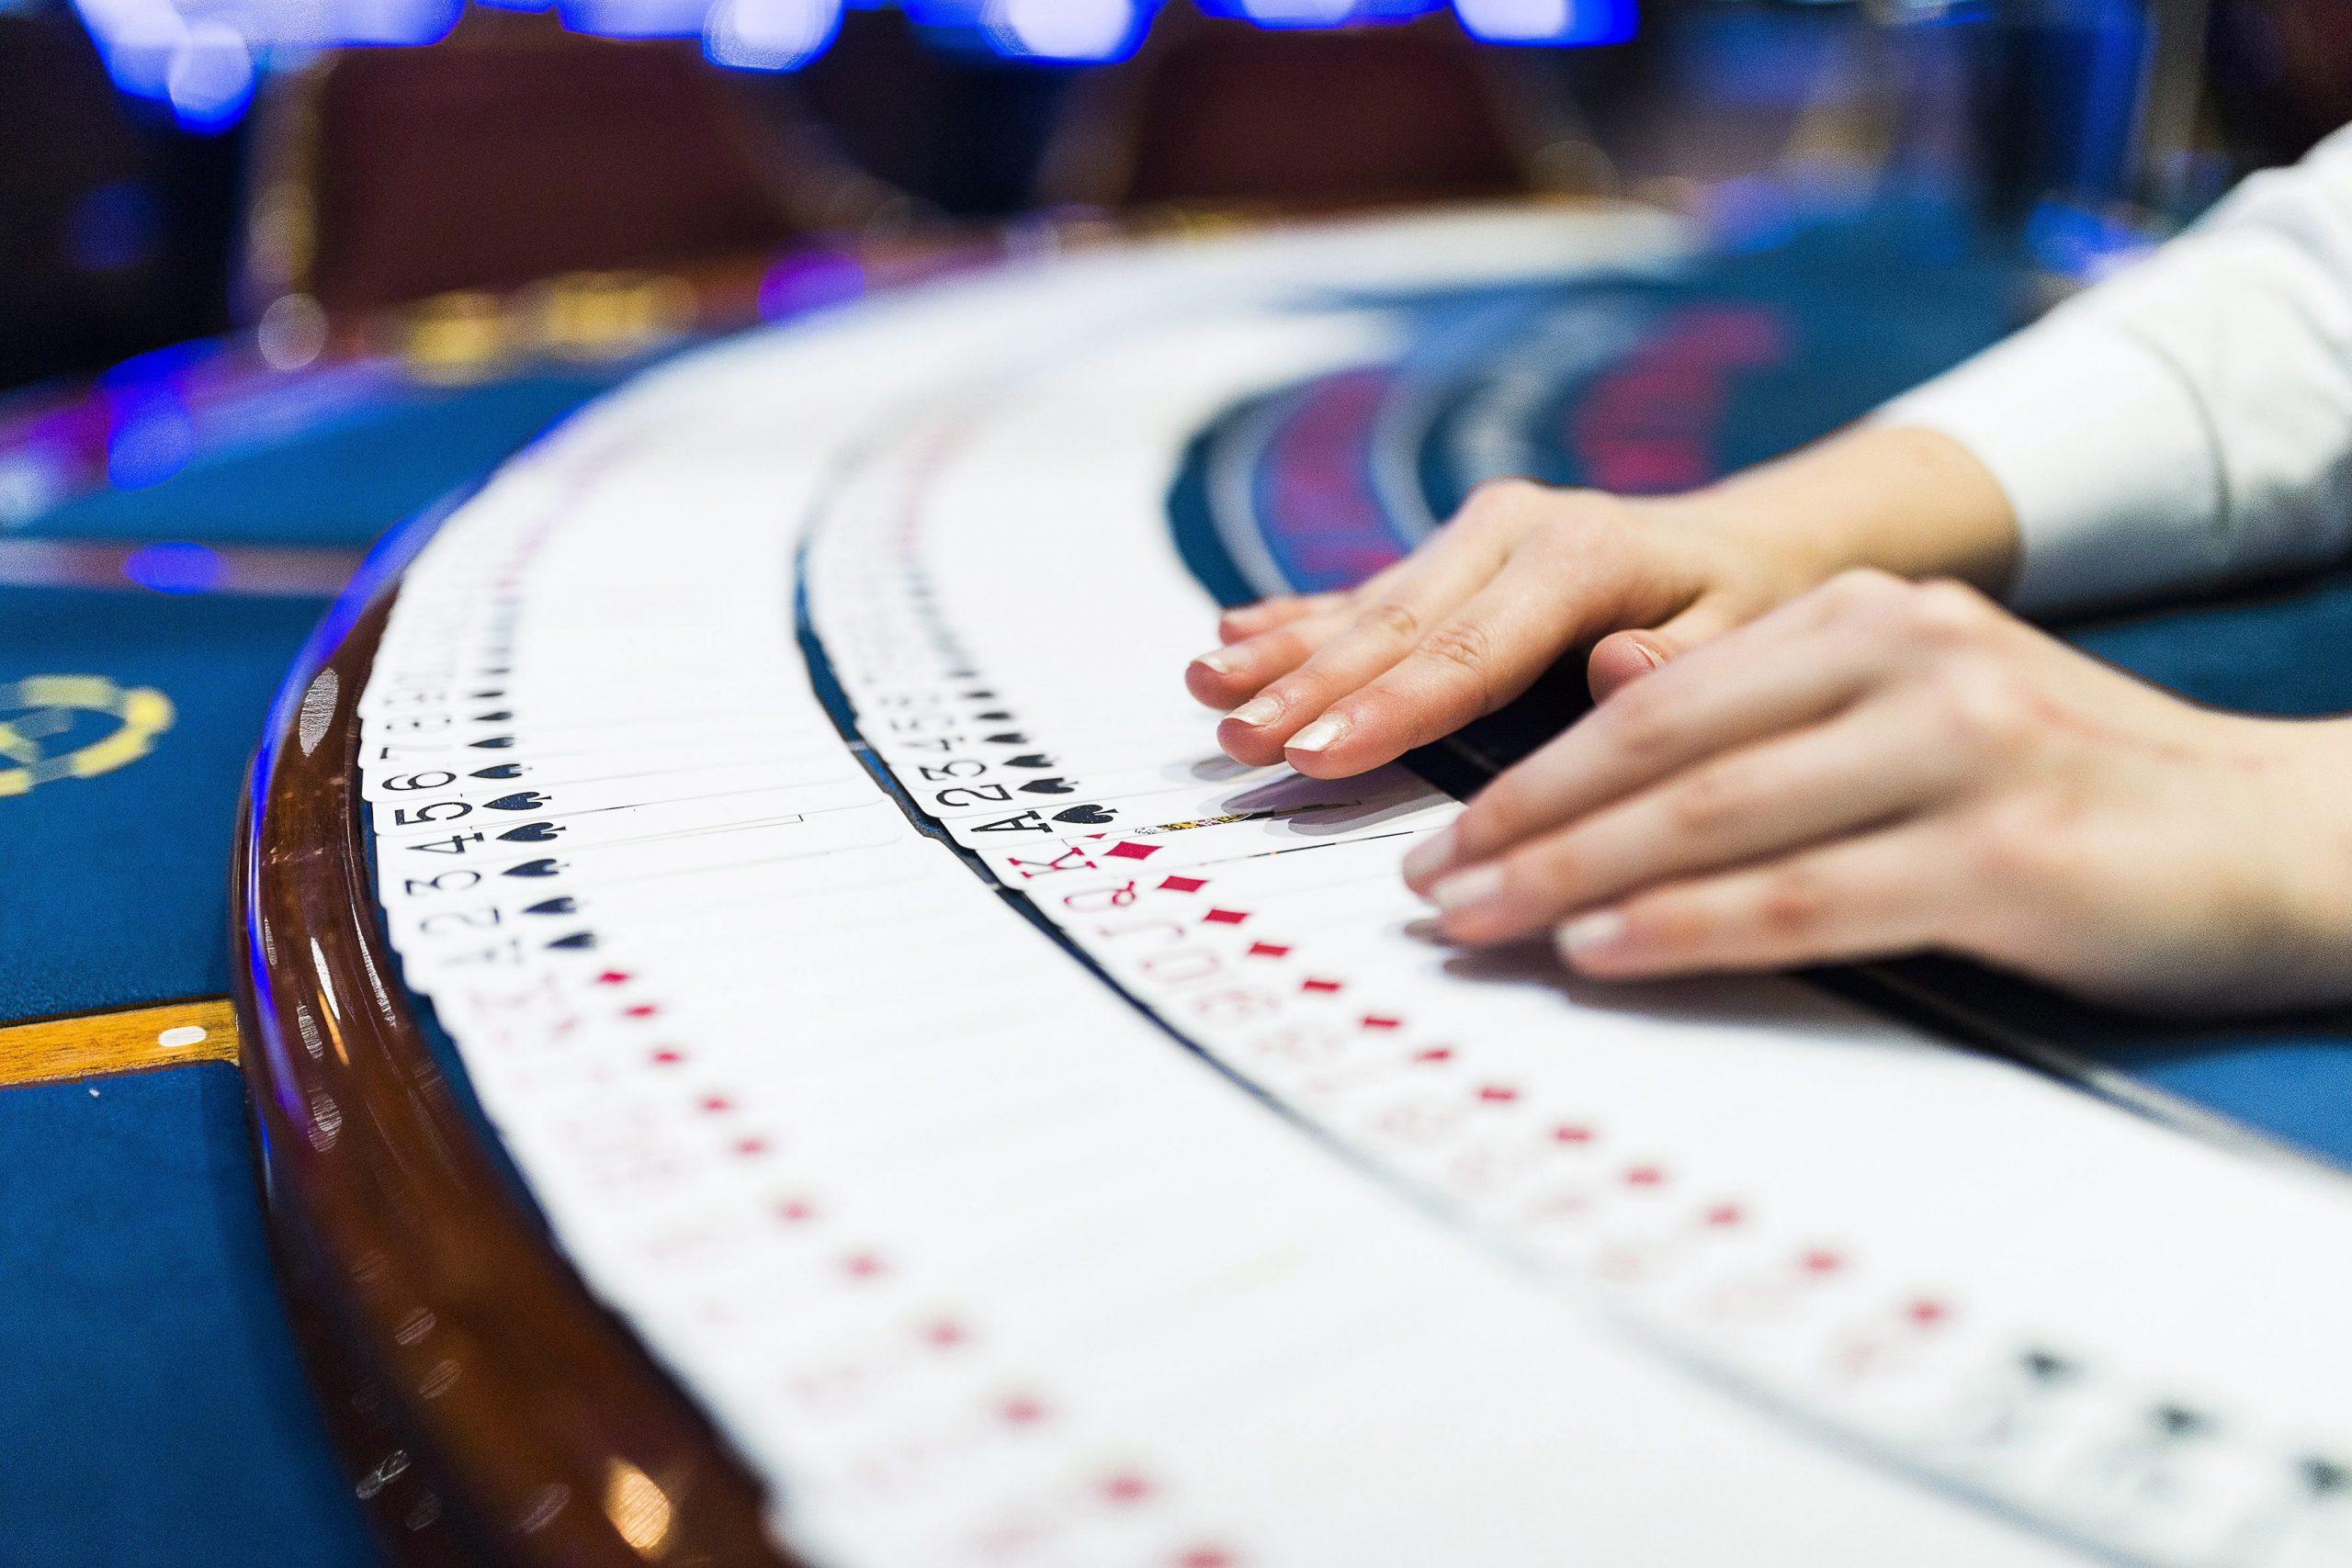 Corona: Casinos blieben offen - Viele sind empört